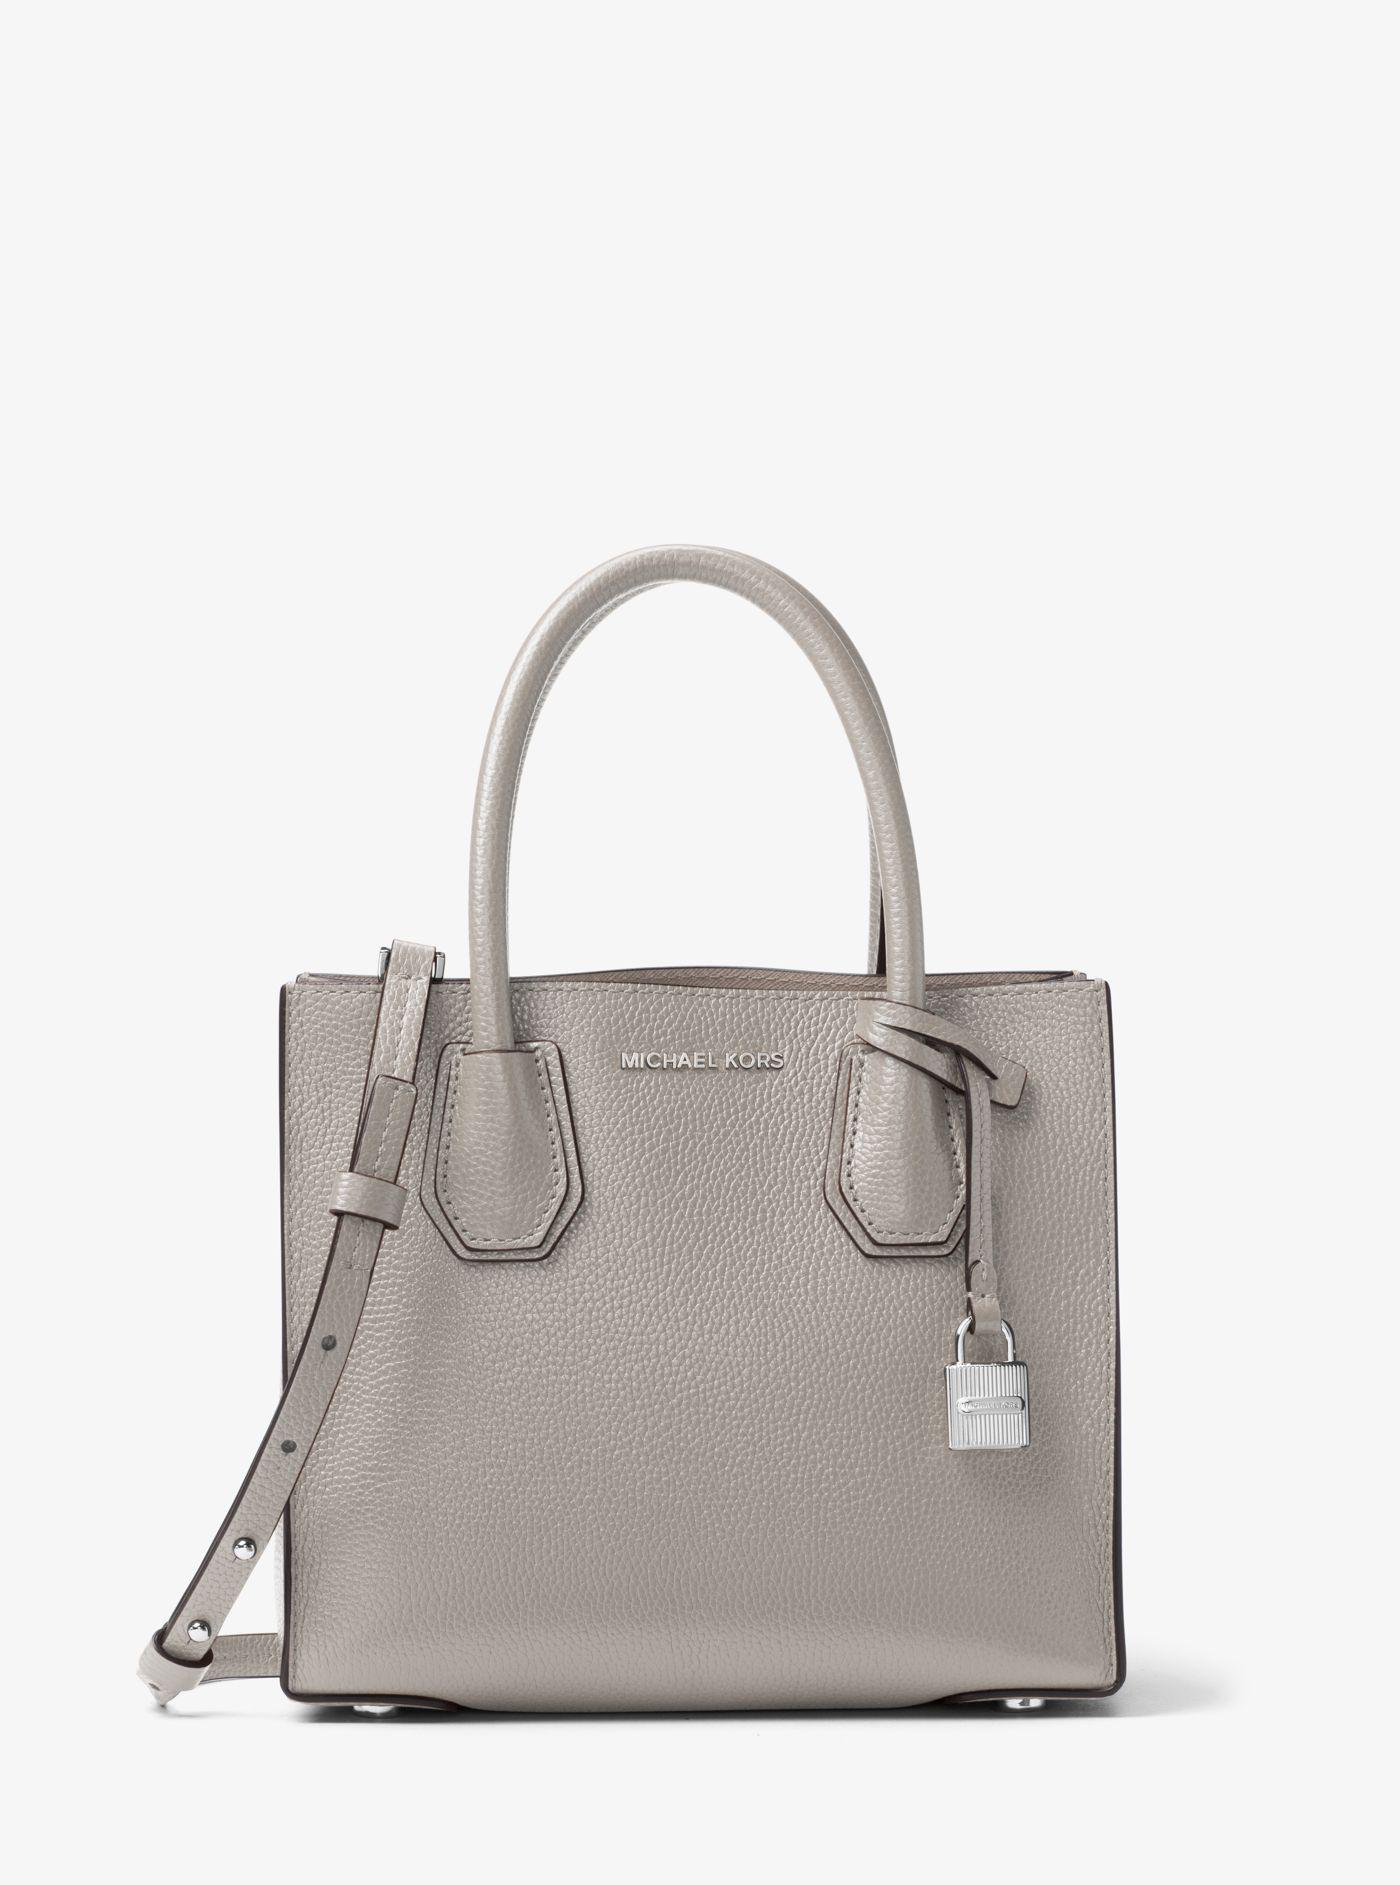 4d47c3f66473 ... cheap michael kors gray mercer medium leather cross body bag lyst. view  fullscreen 80aec 29e13